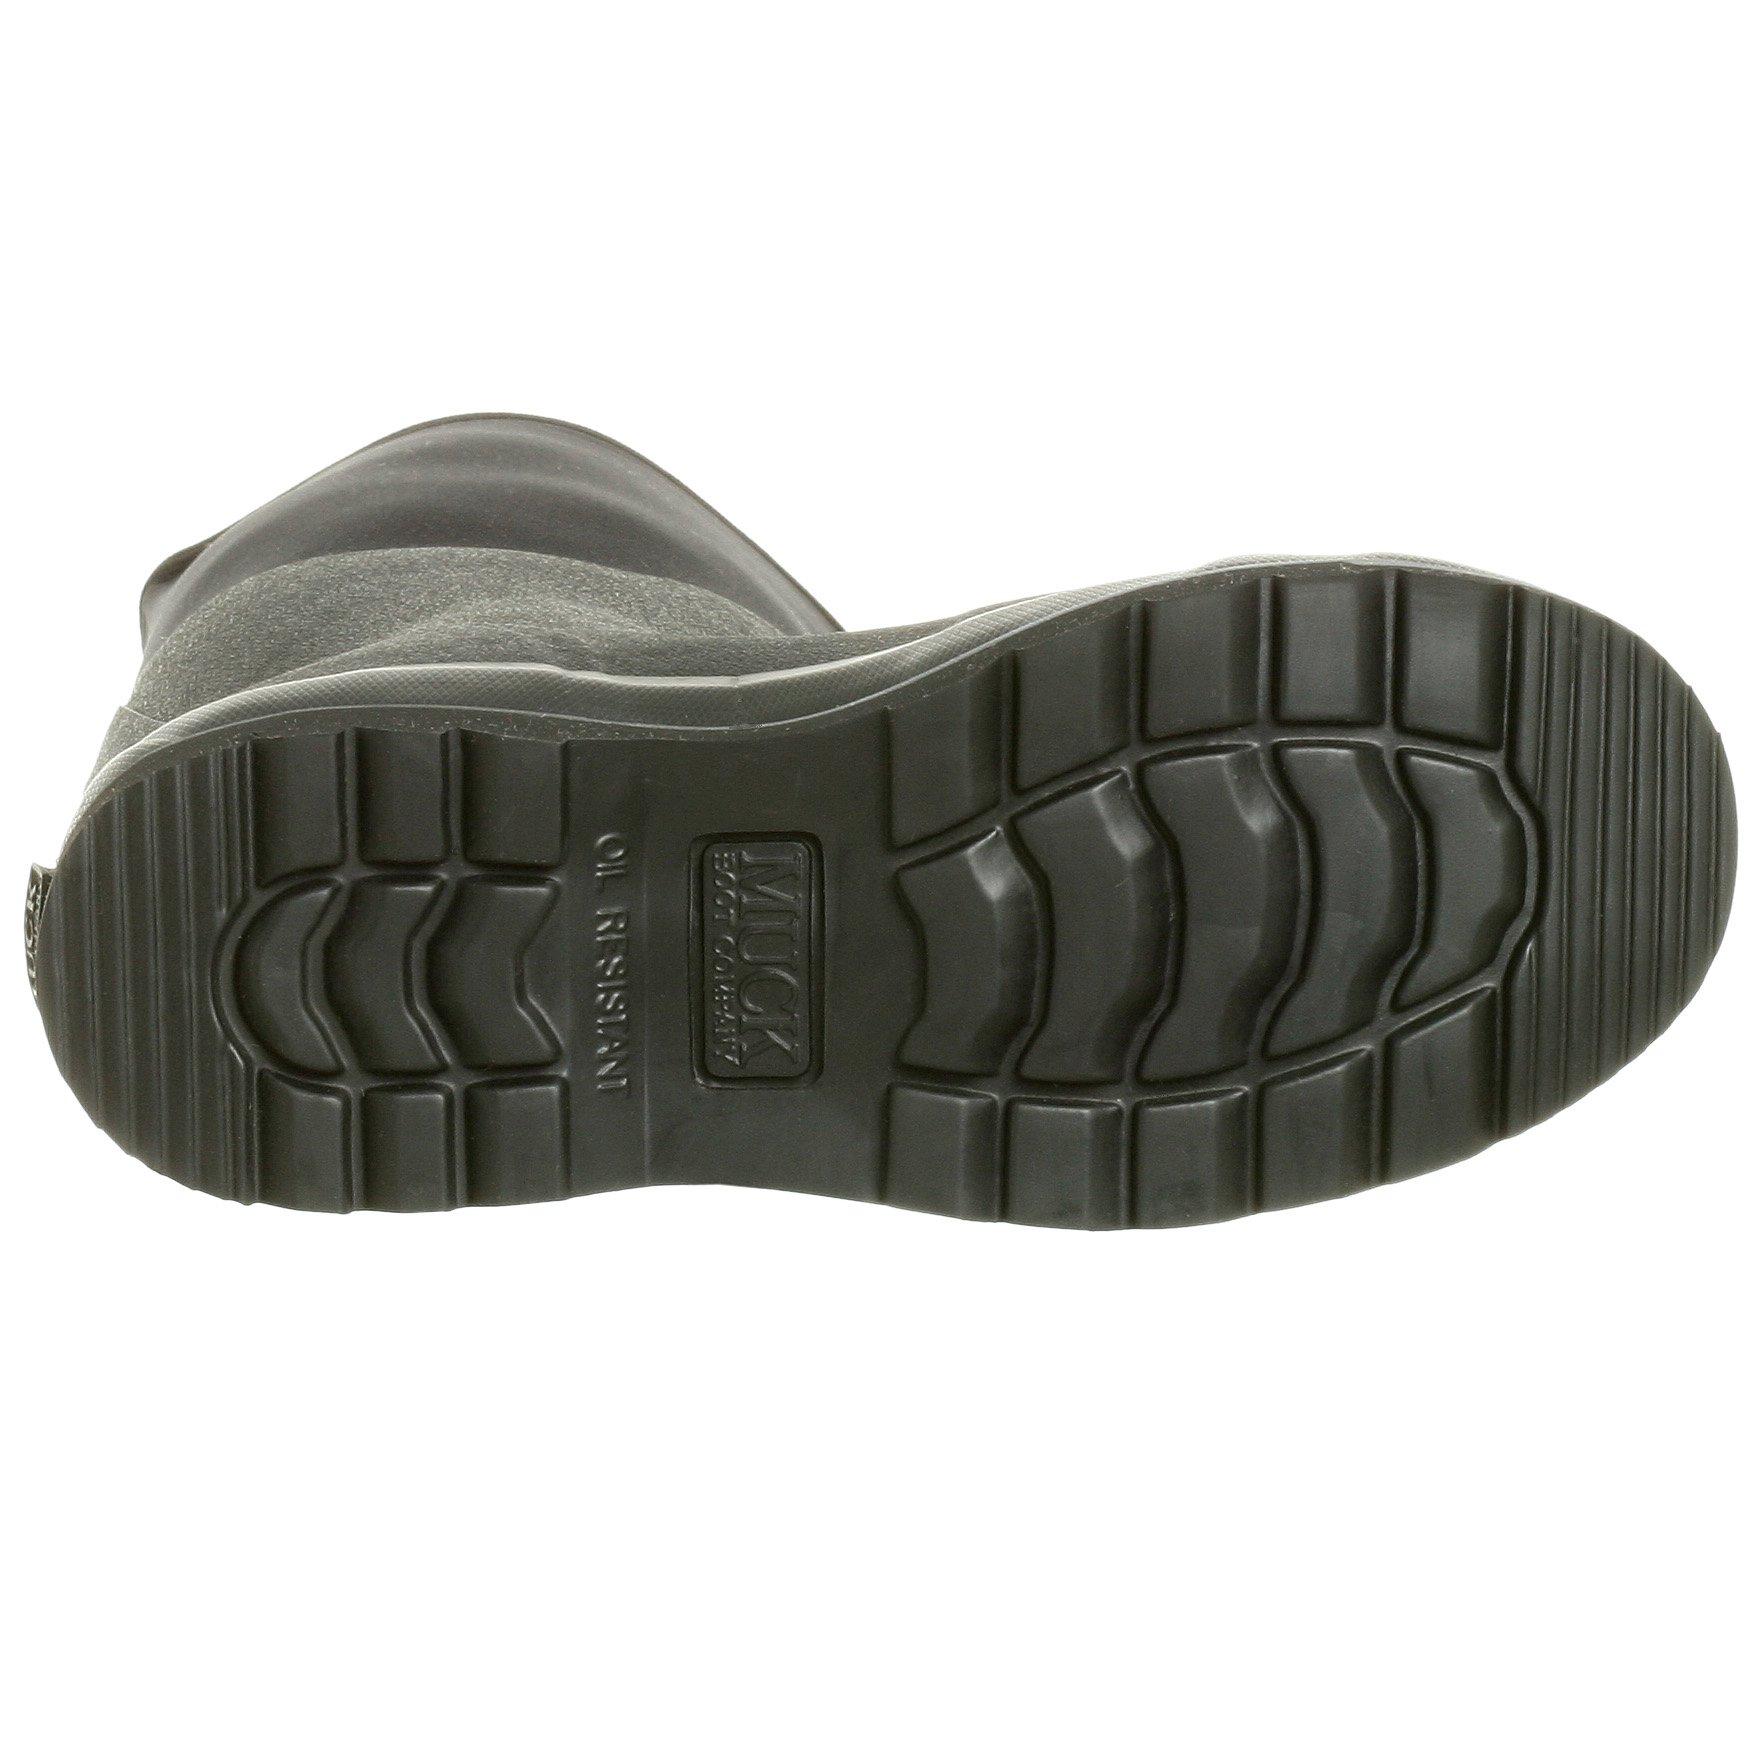 The Original MuckBoots Adult Chore Hi Boot Steel Toe,Black,Men's 12 M/Women's 13 M by Muck Boot (Image #3)